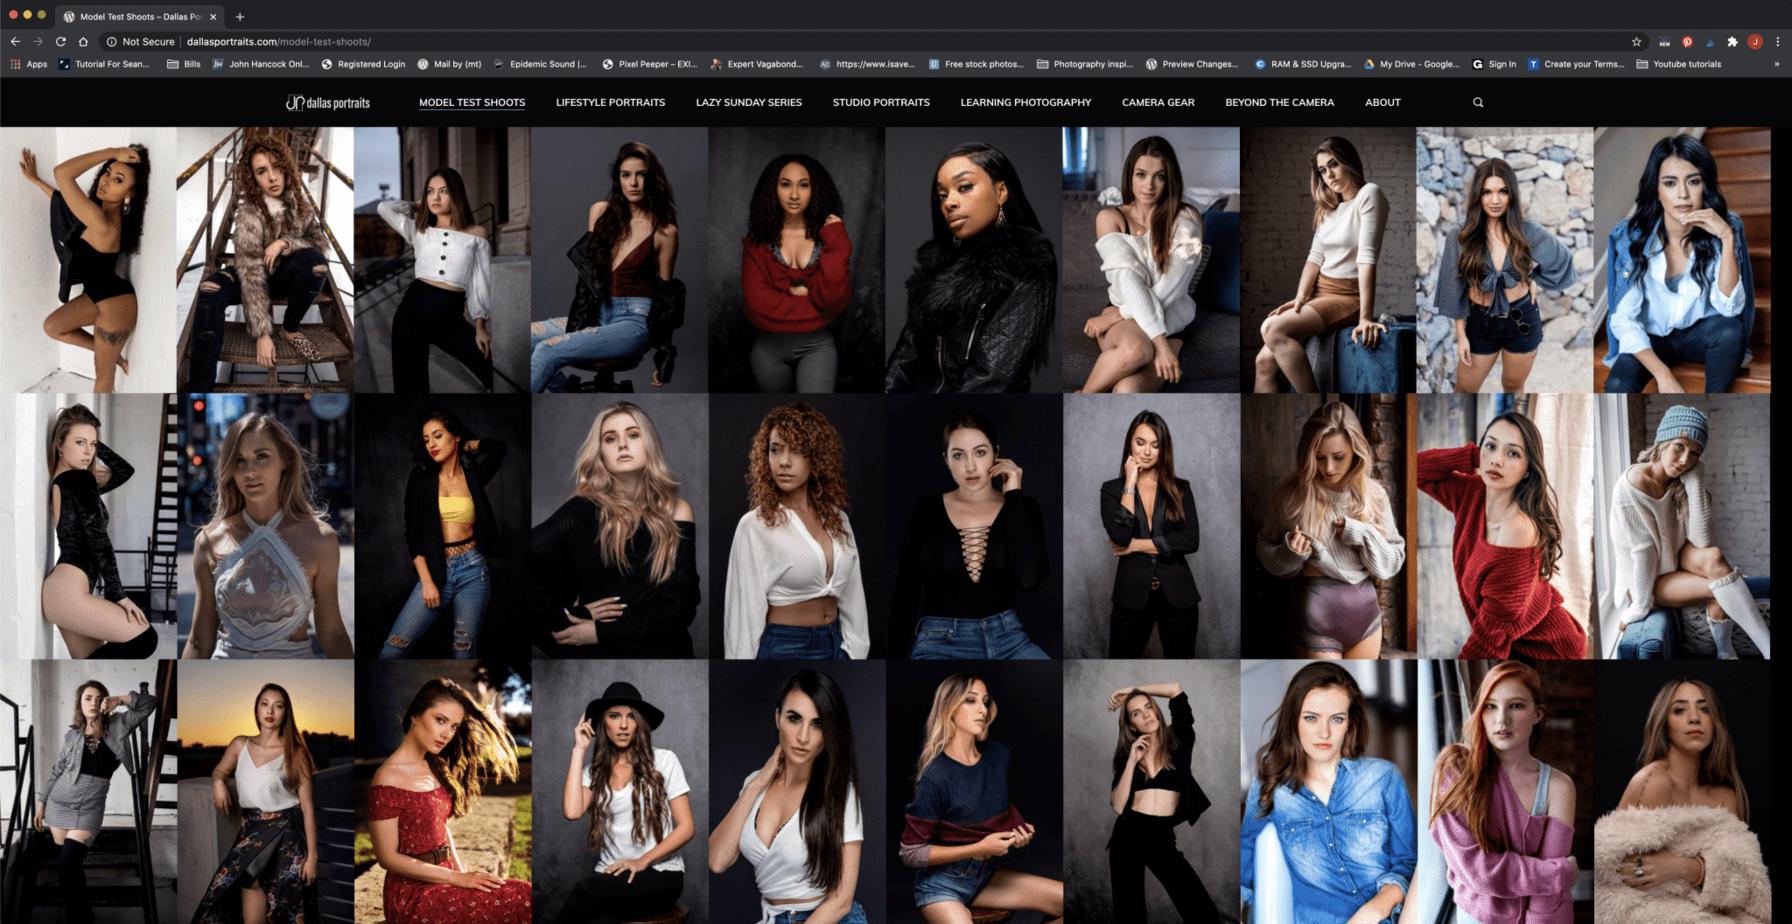 dallasportraits.com | Sony portraits